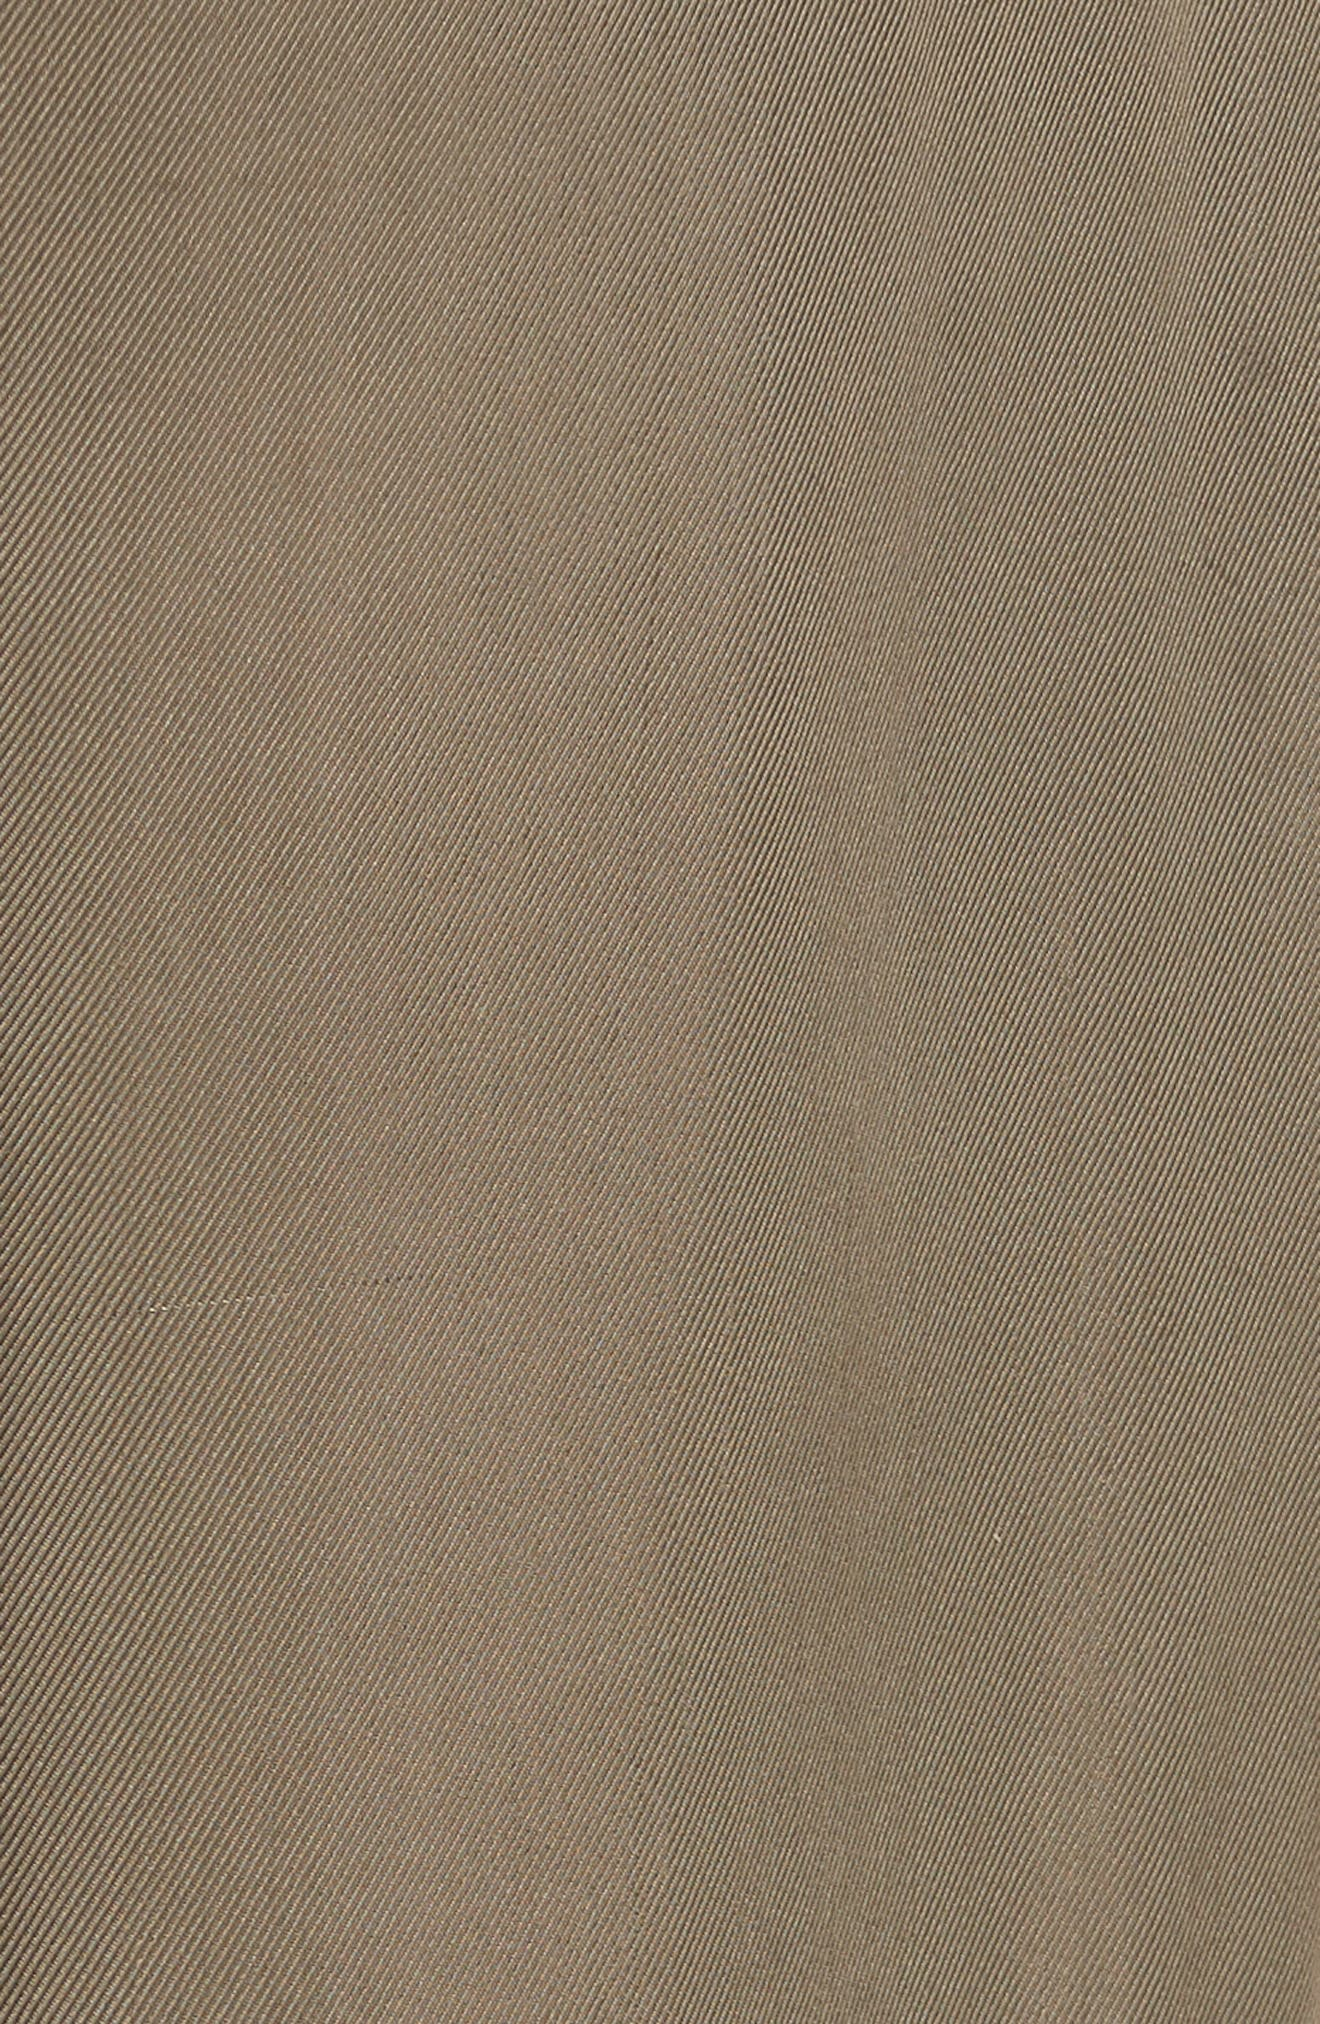 Avery Ruffle Tier Pants,                             Alternate thumbnail 5, color,                             Olive